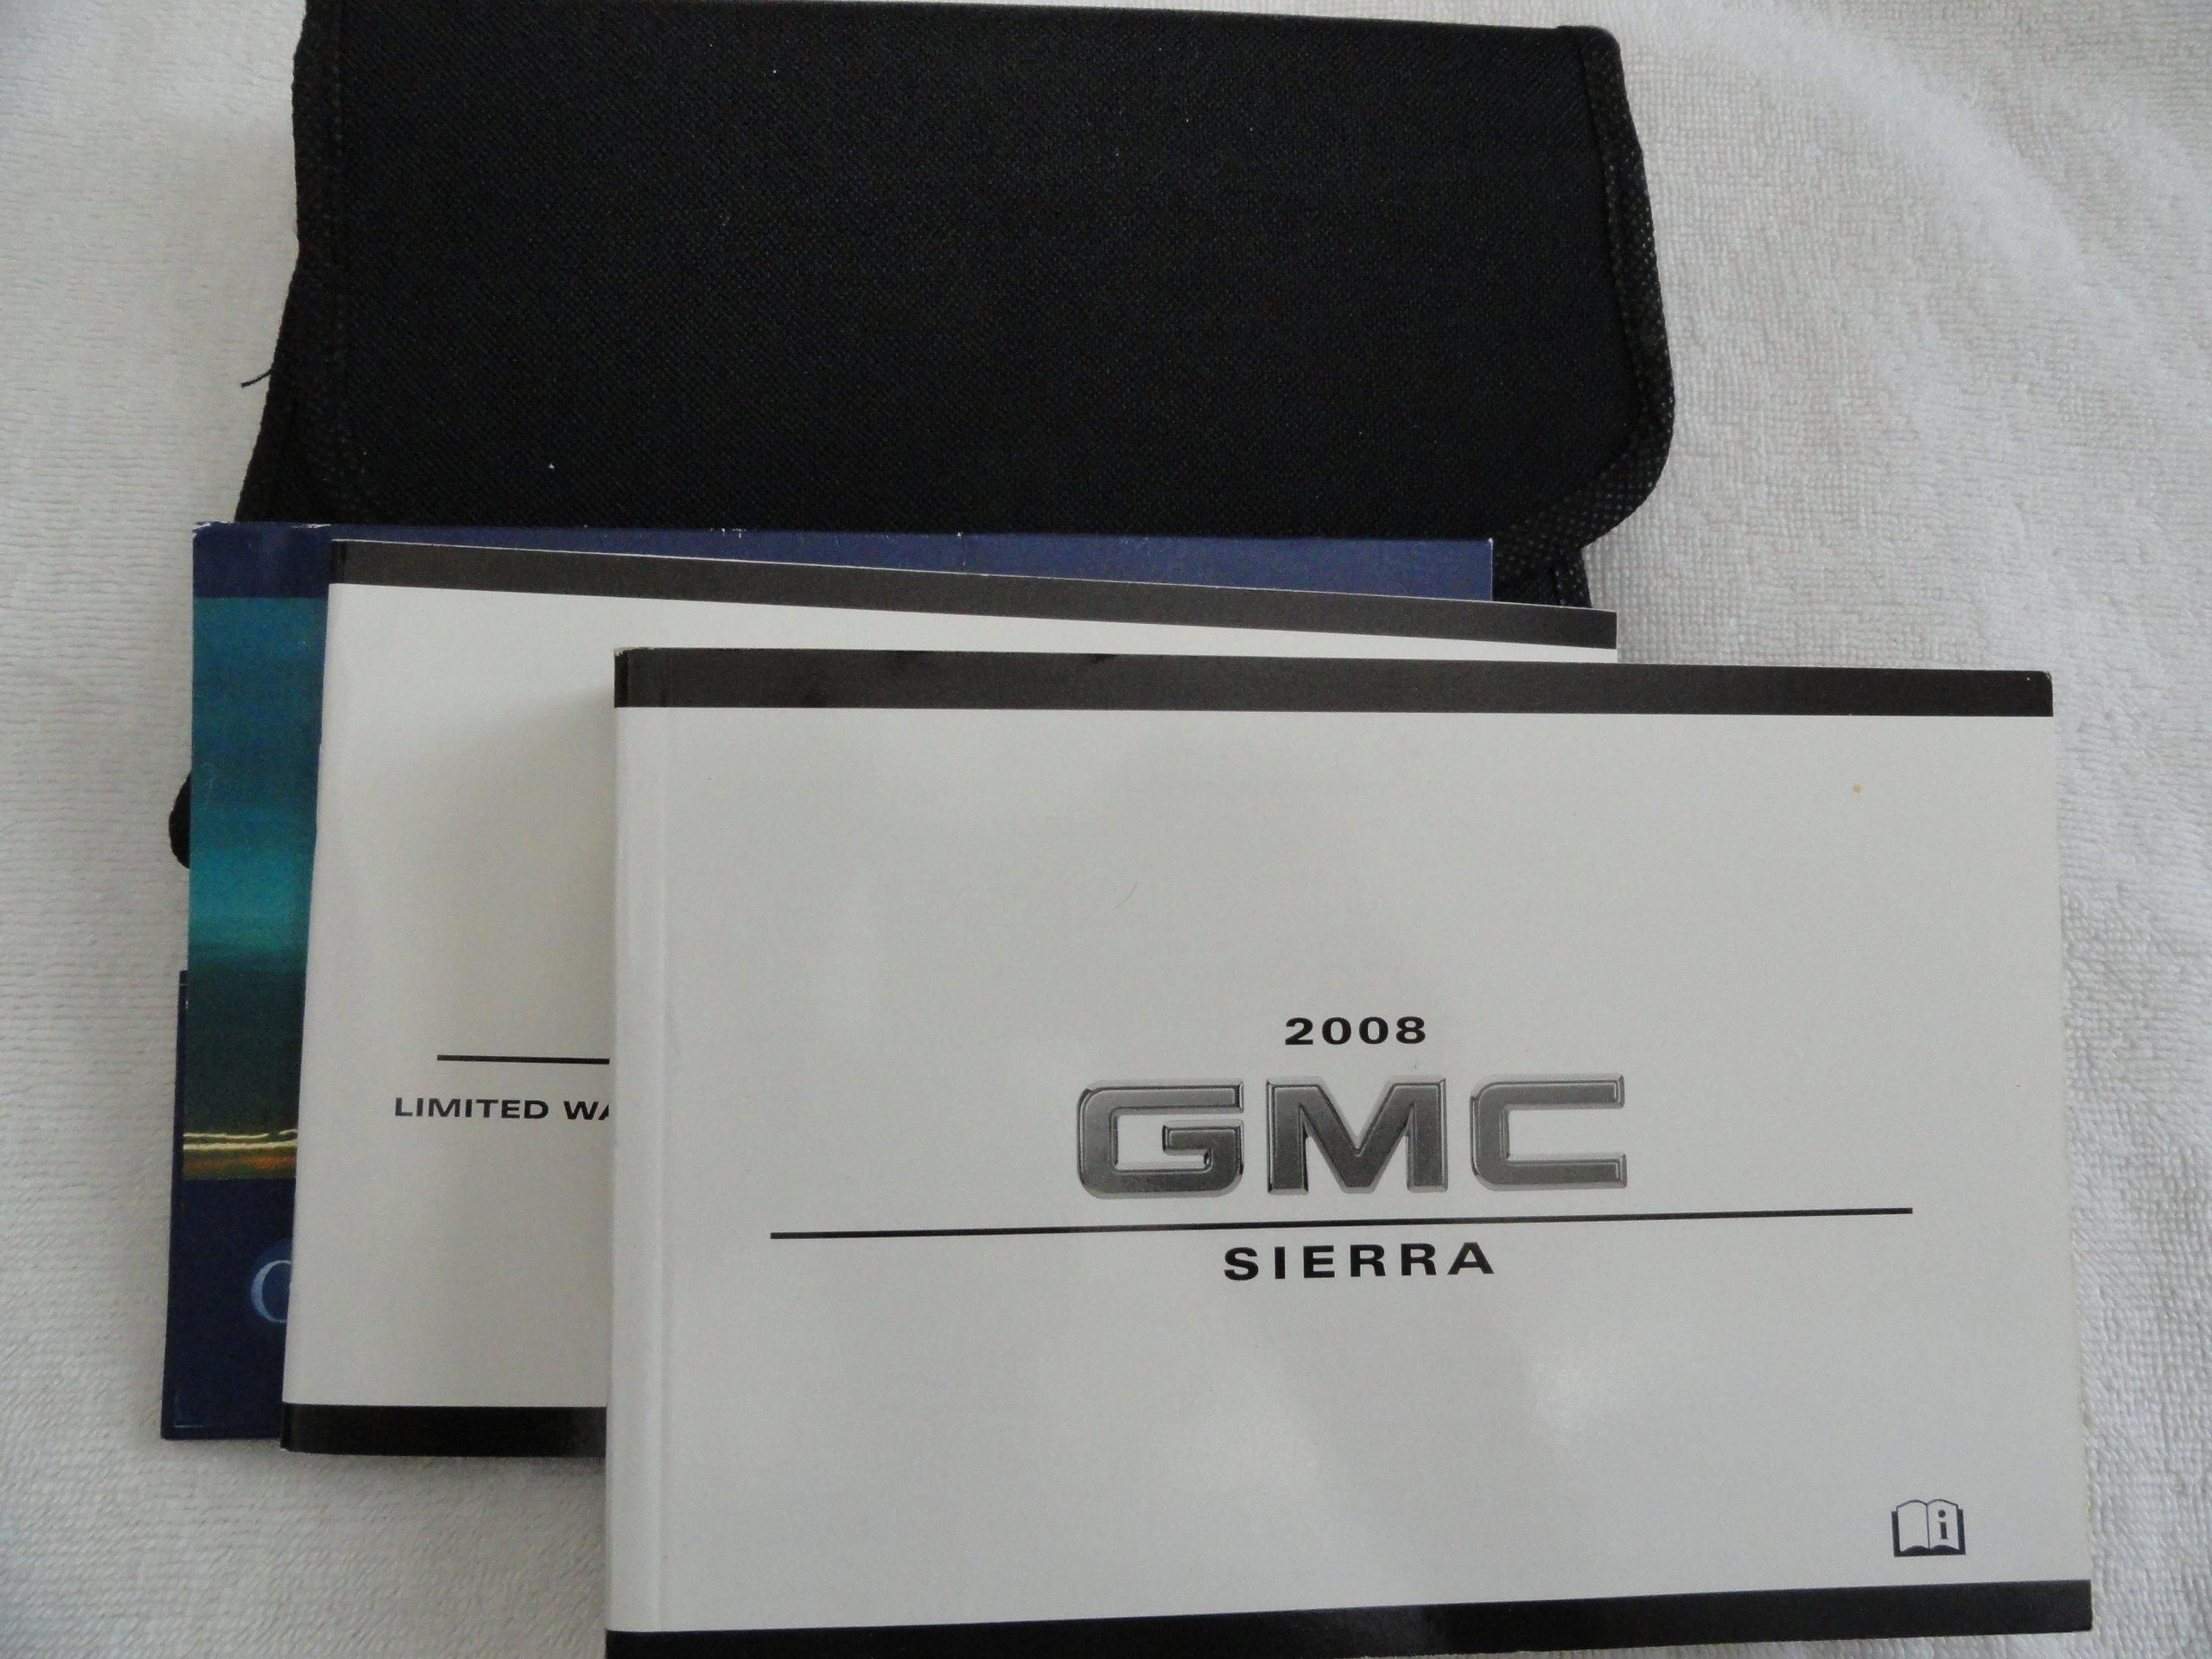 2008 gmc sierra owner s manual gmc amazon com books rh amazon com 2008 gmc sierra 2500hd duramax owners manual owners manual for 2008 gmc sierra 1500